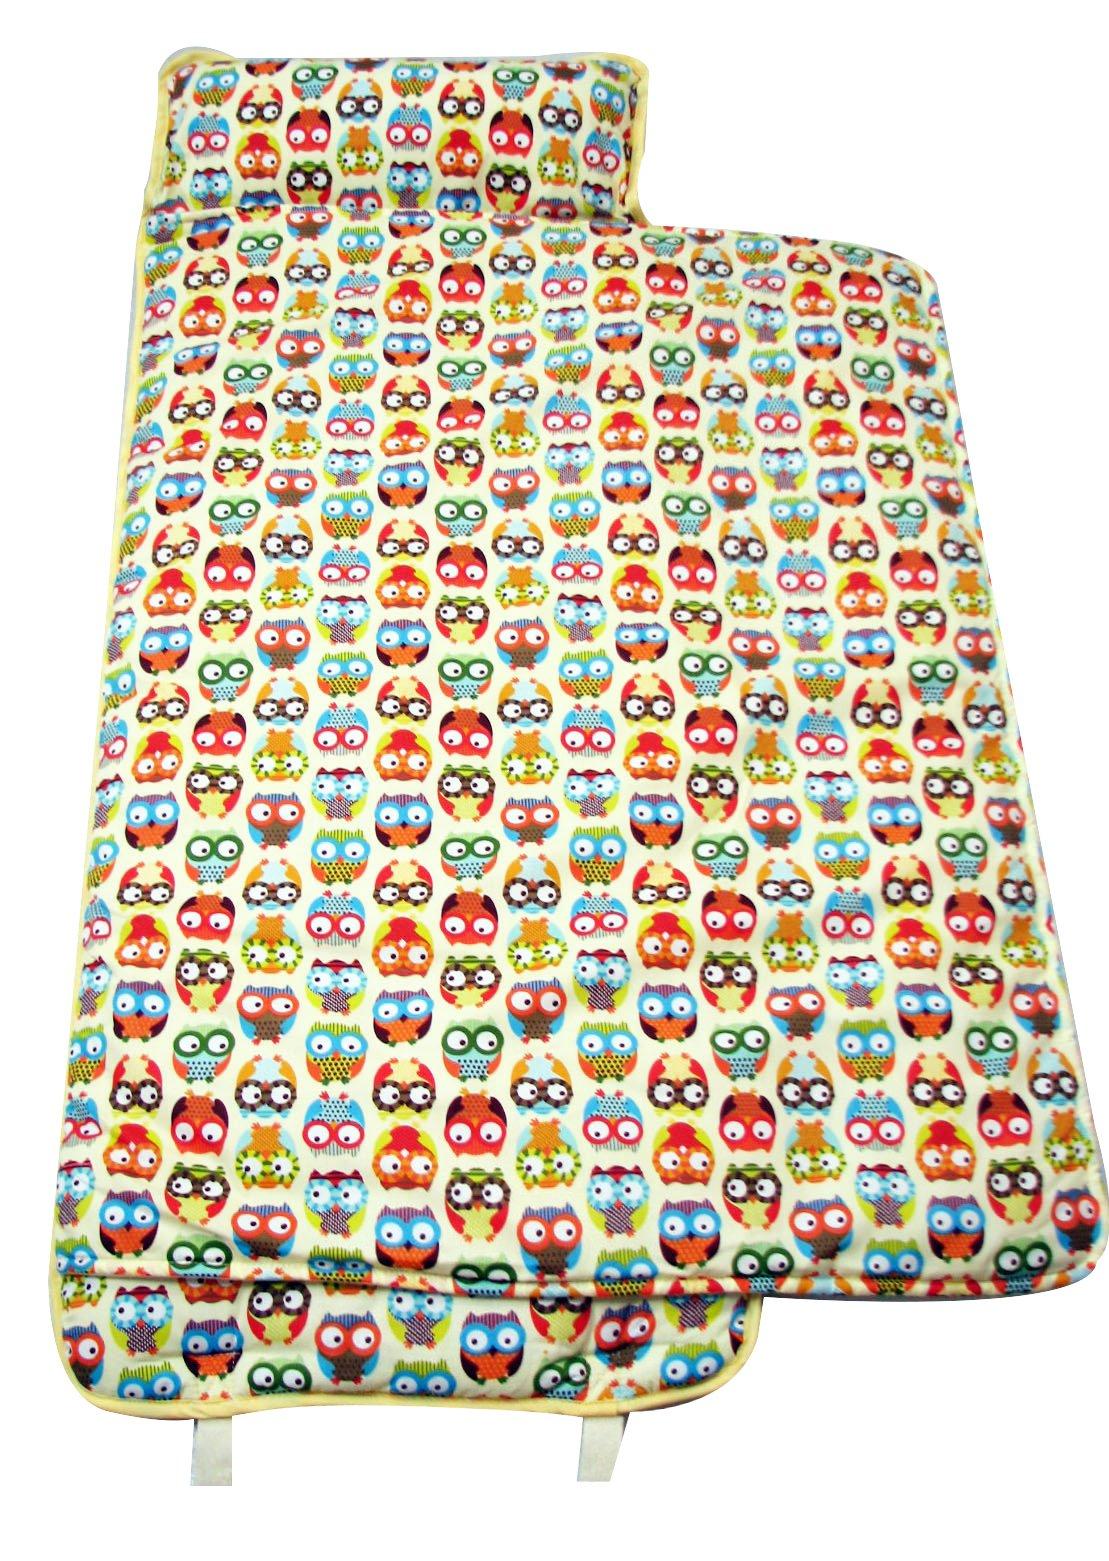 SoHo Nap Mat , Cutie Owls by Ellie and Luke (Image #1)